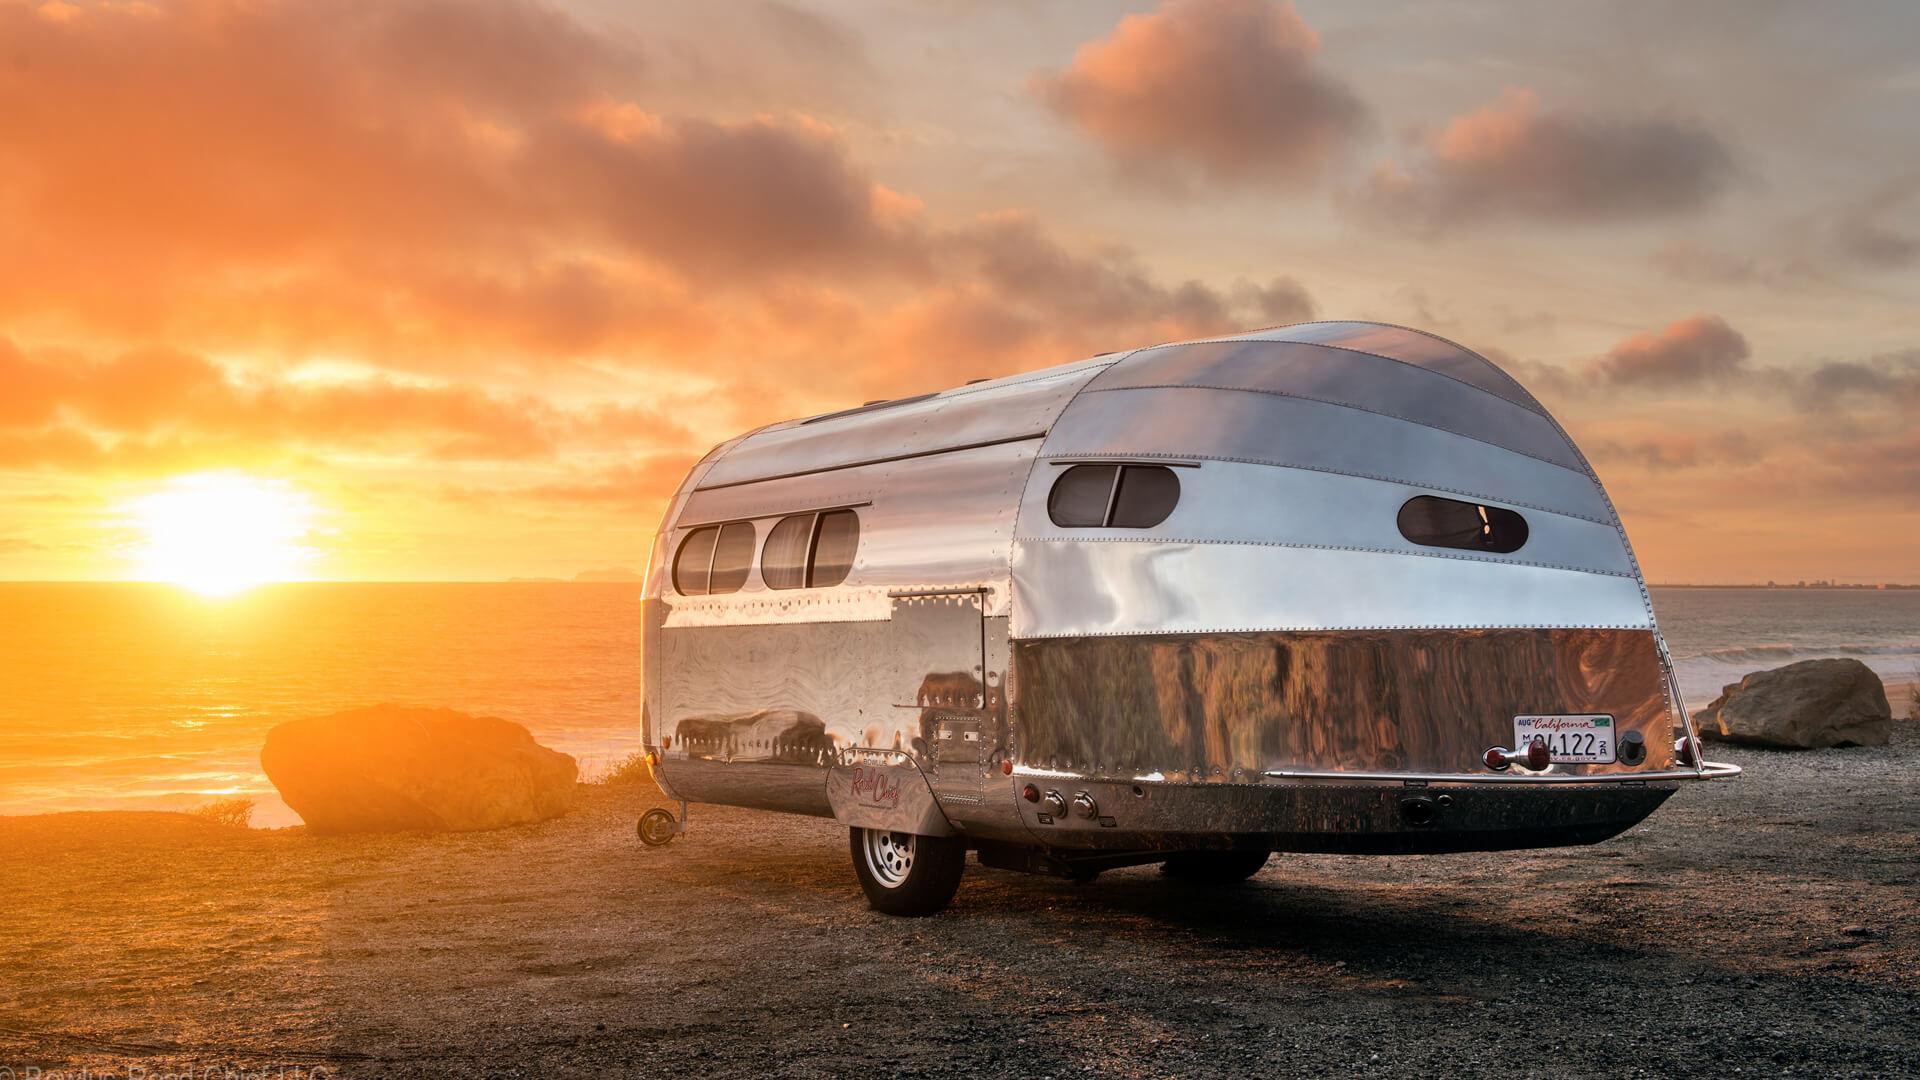 Bowlus Road Chief On The Road® - The Luxury Aluminum Travel...